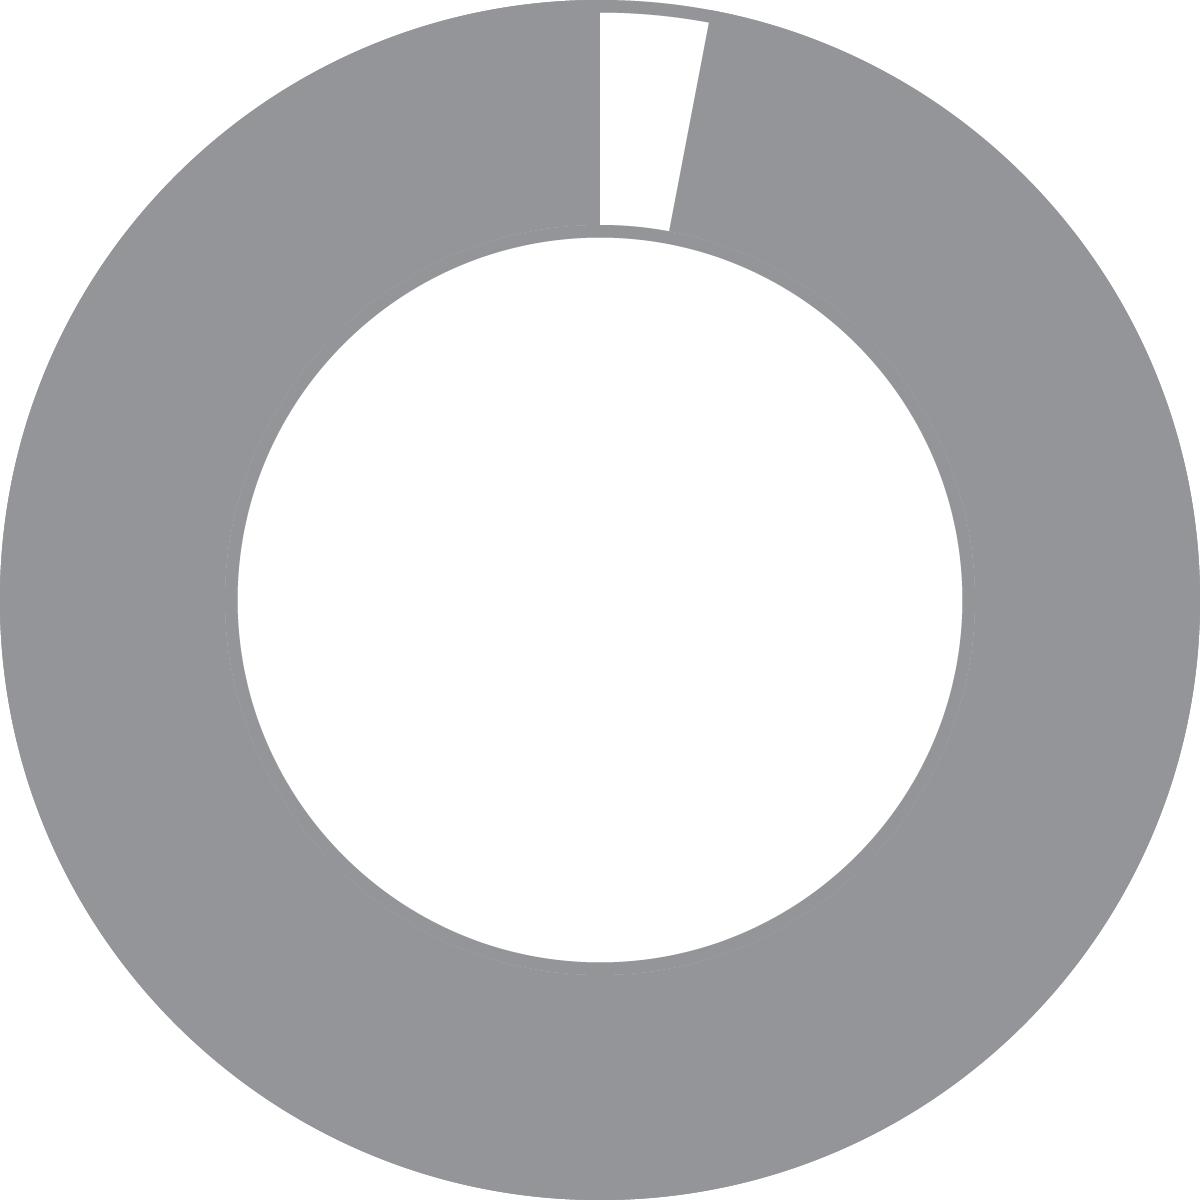 Donut Chart 97%